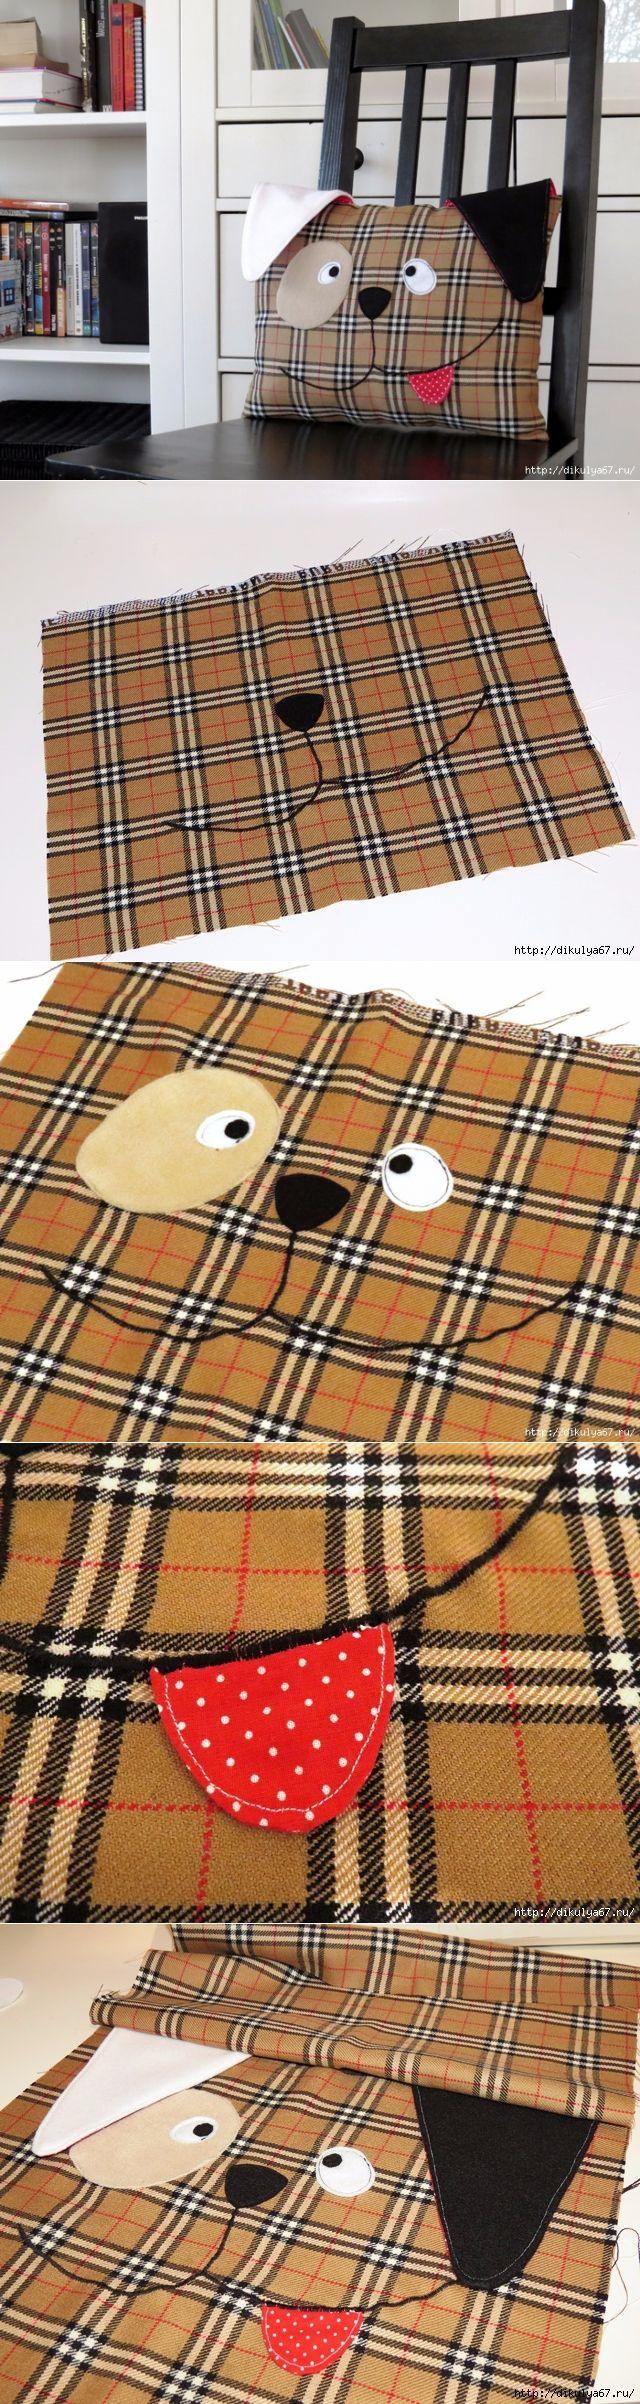 Подушка в детскую комнату. Шьем подушку-собачку